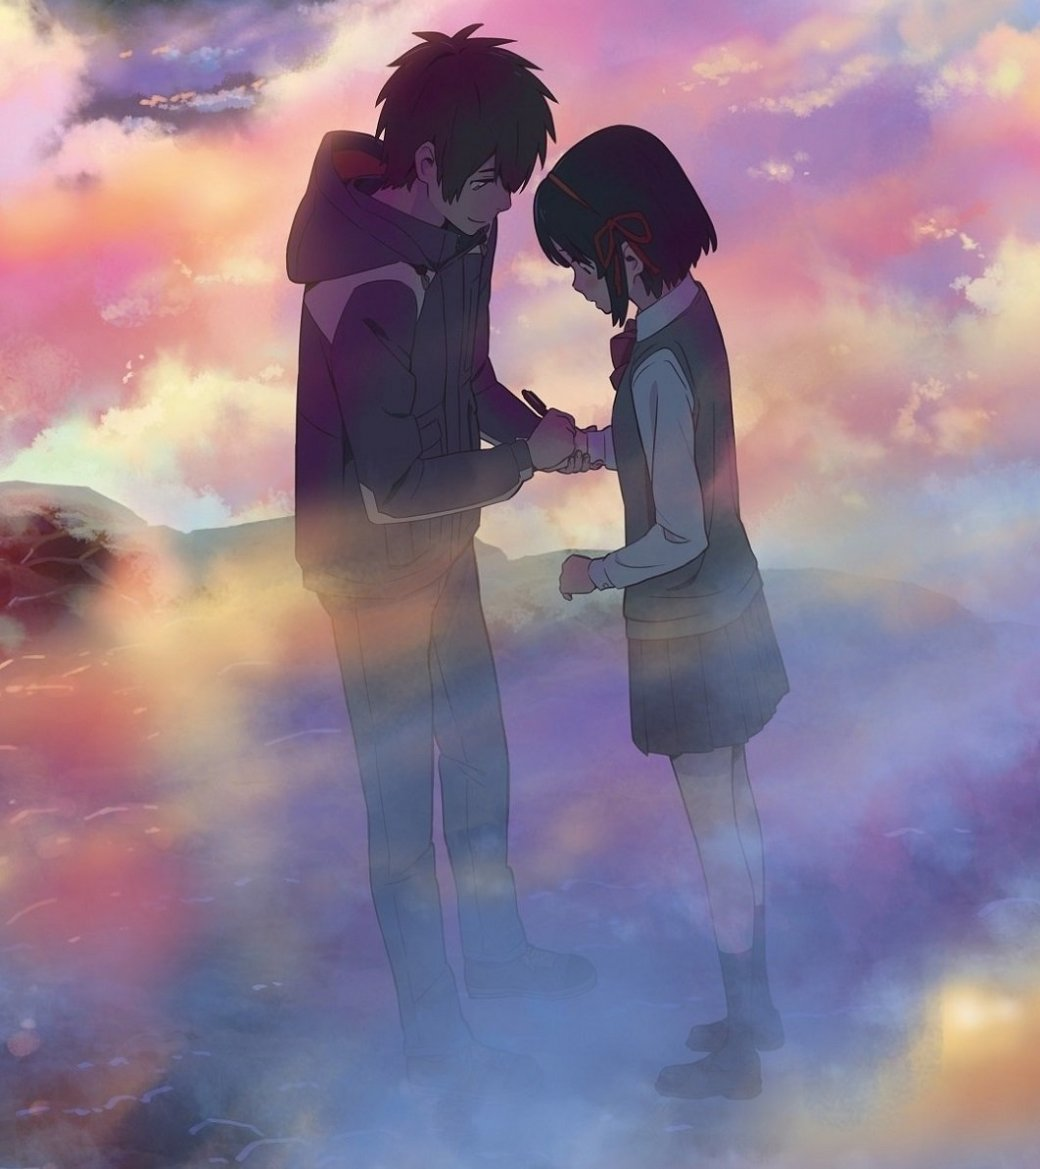 Рецензия на«Твое имя» Макото Синкая | Канобу - Изображение 3